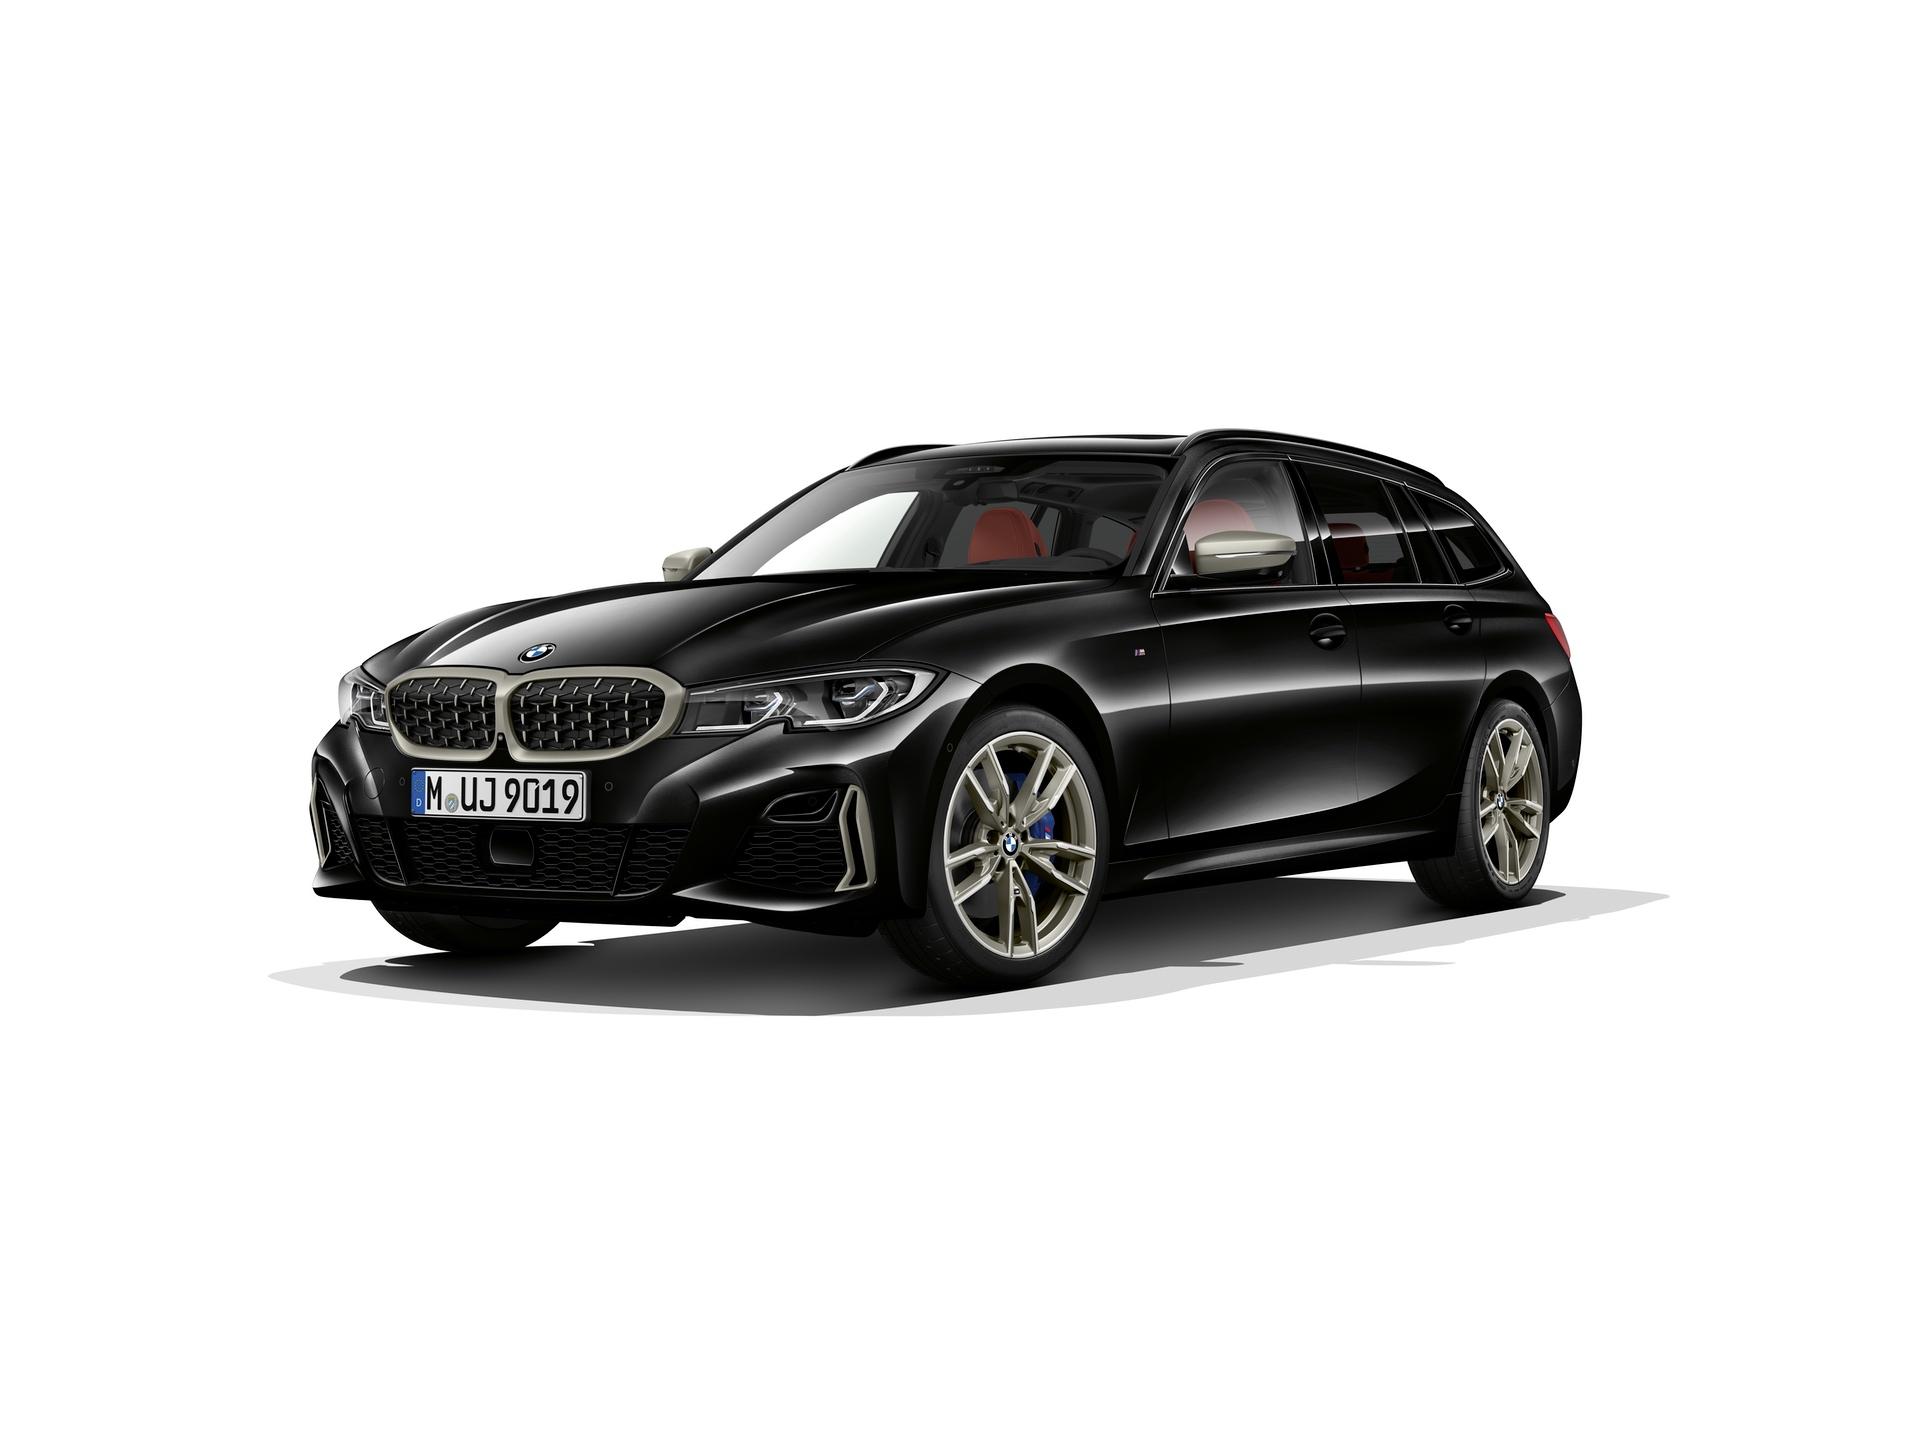 2019 BMW M340i Touring 01